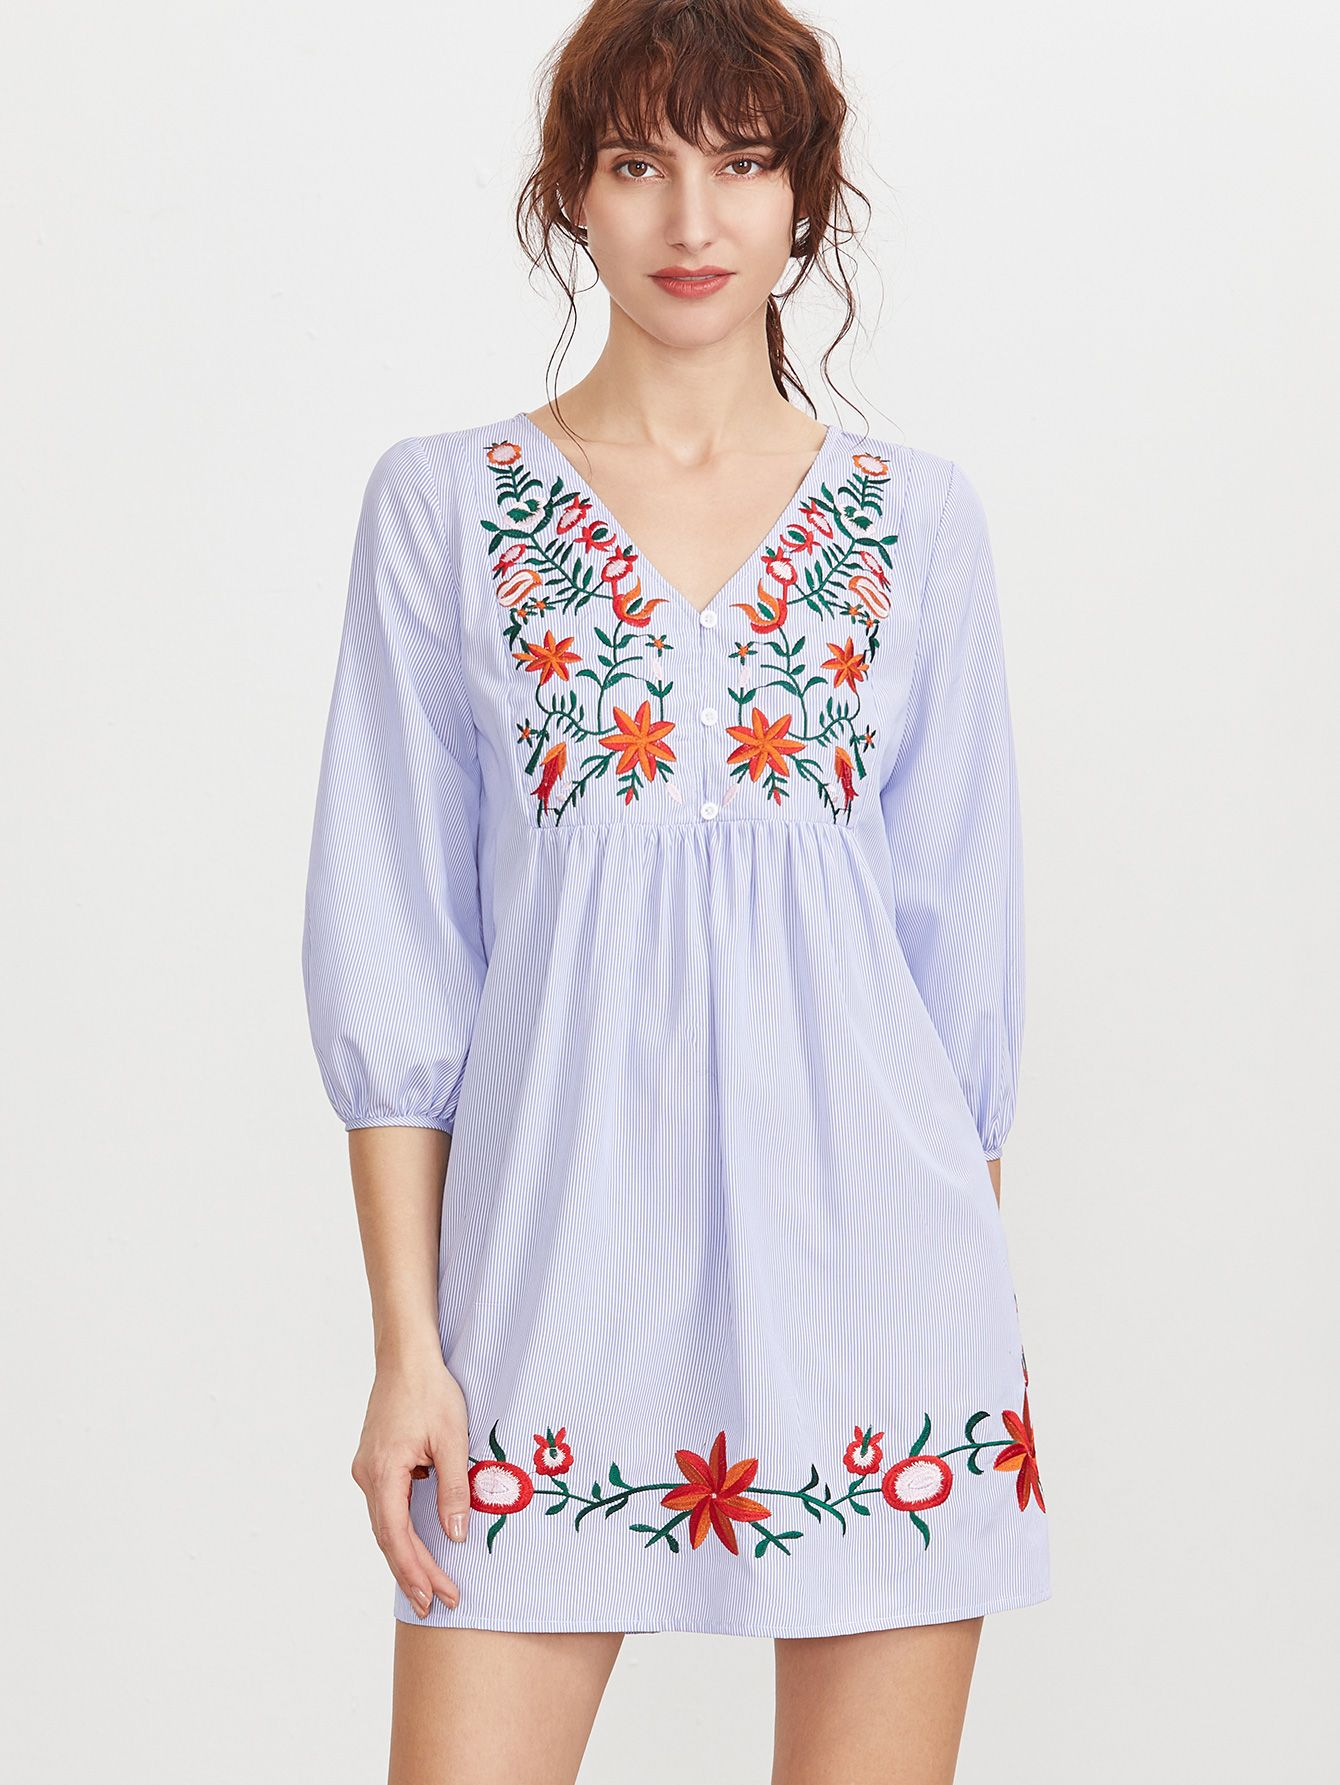 befb641bc4 dress161227714 2 Vestidos Tradicionales